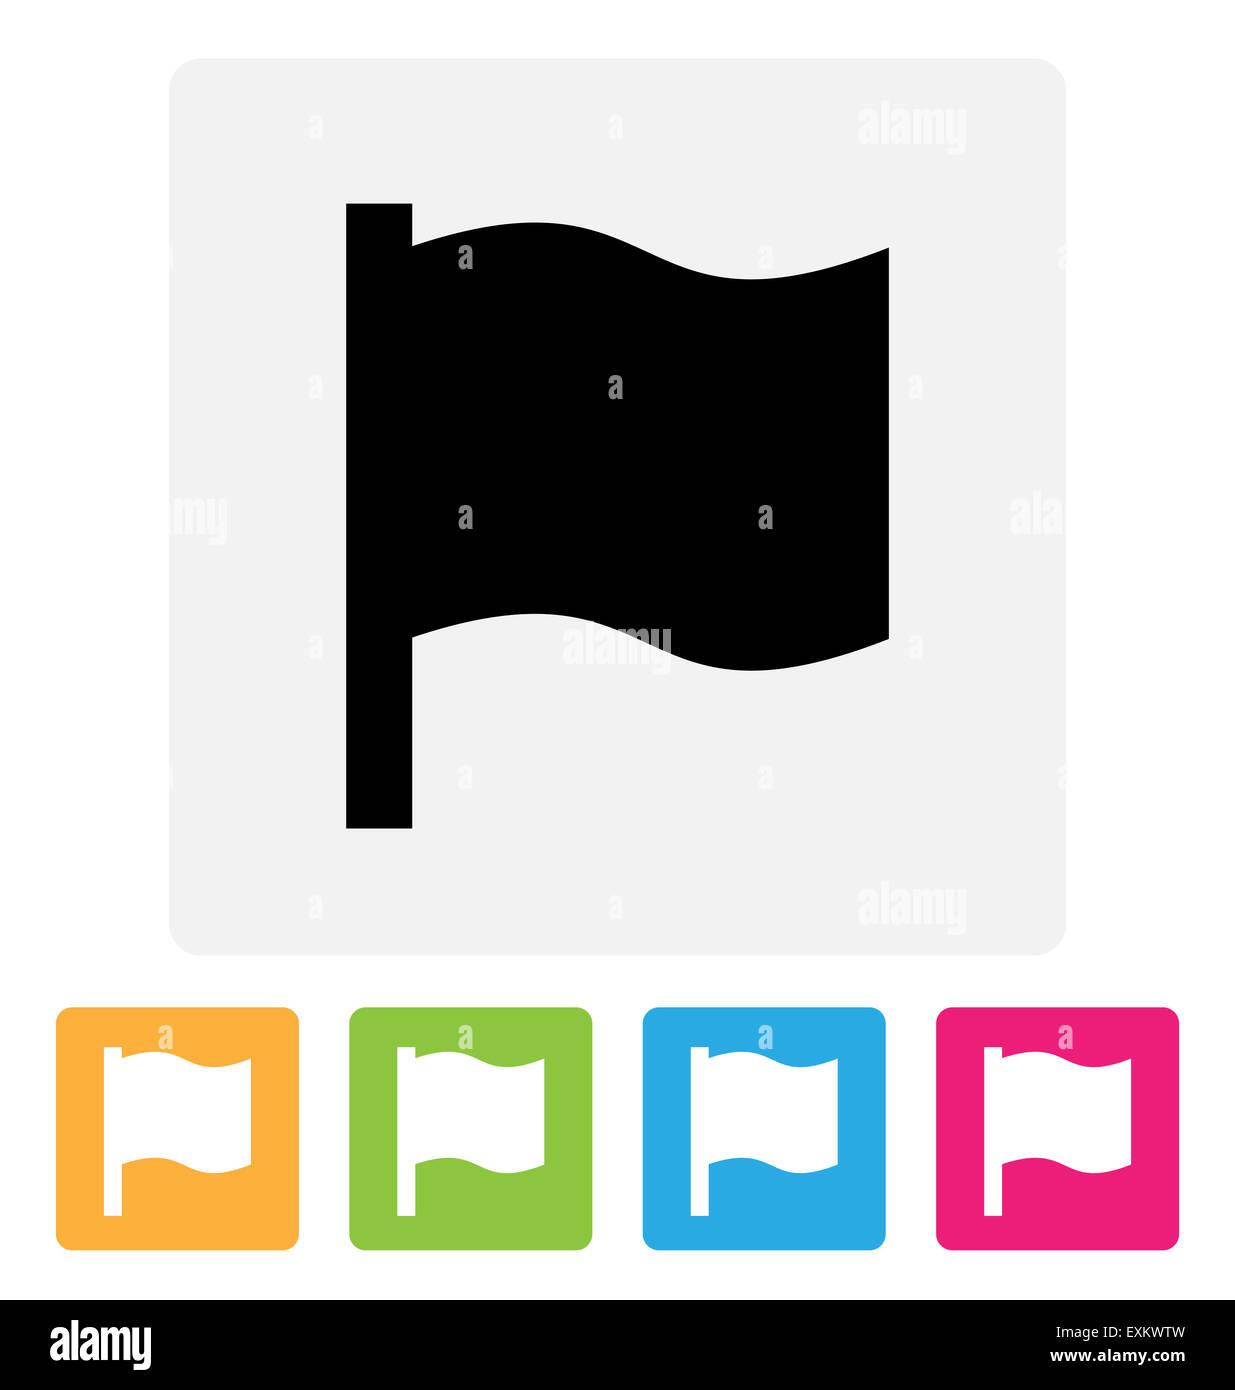 Waving flag icon - Stock Image